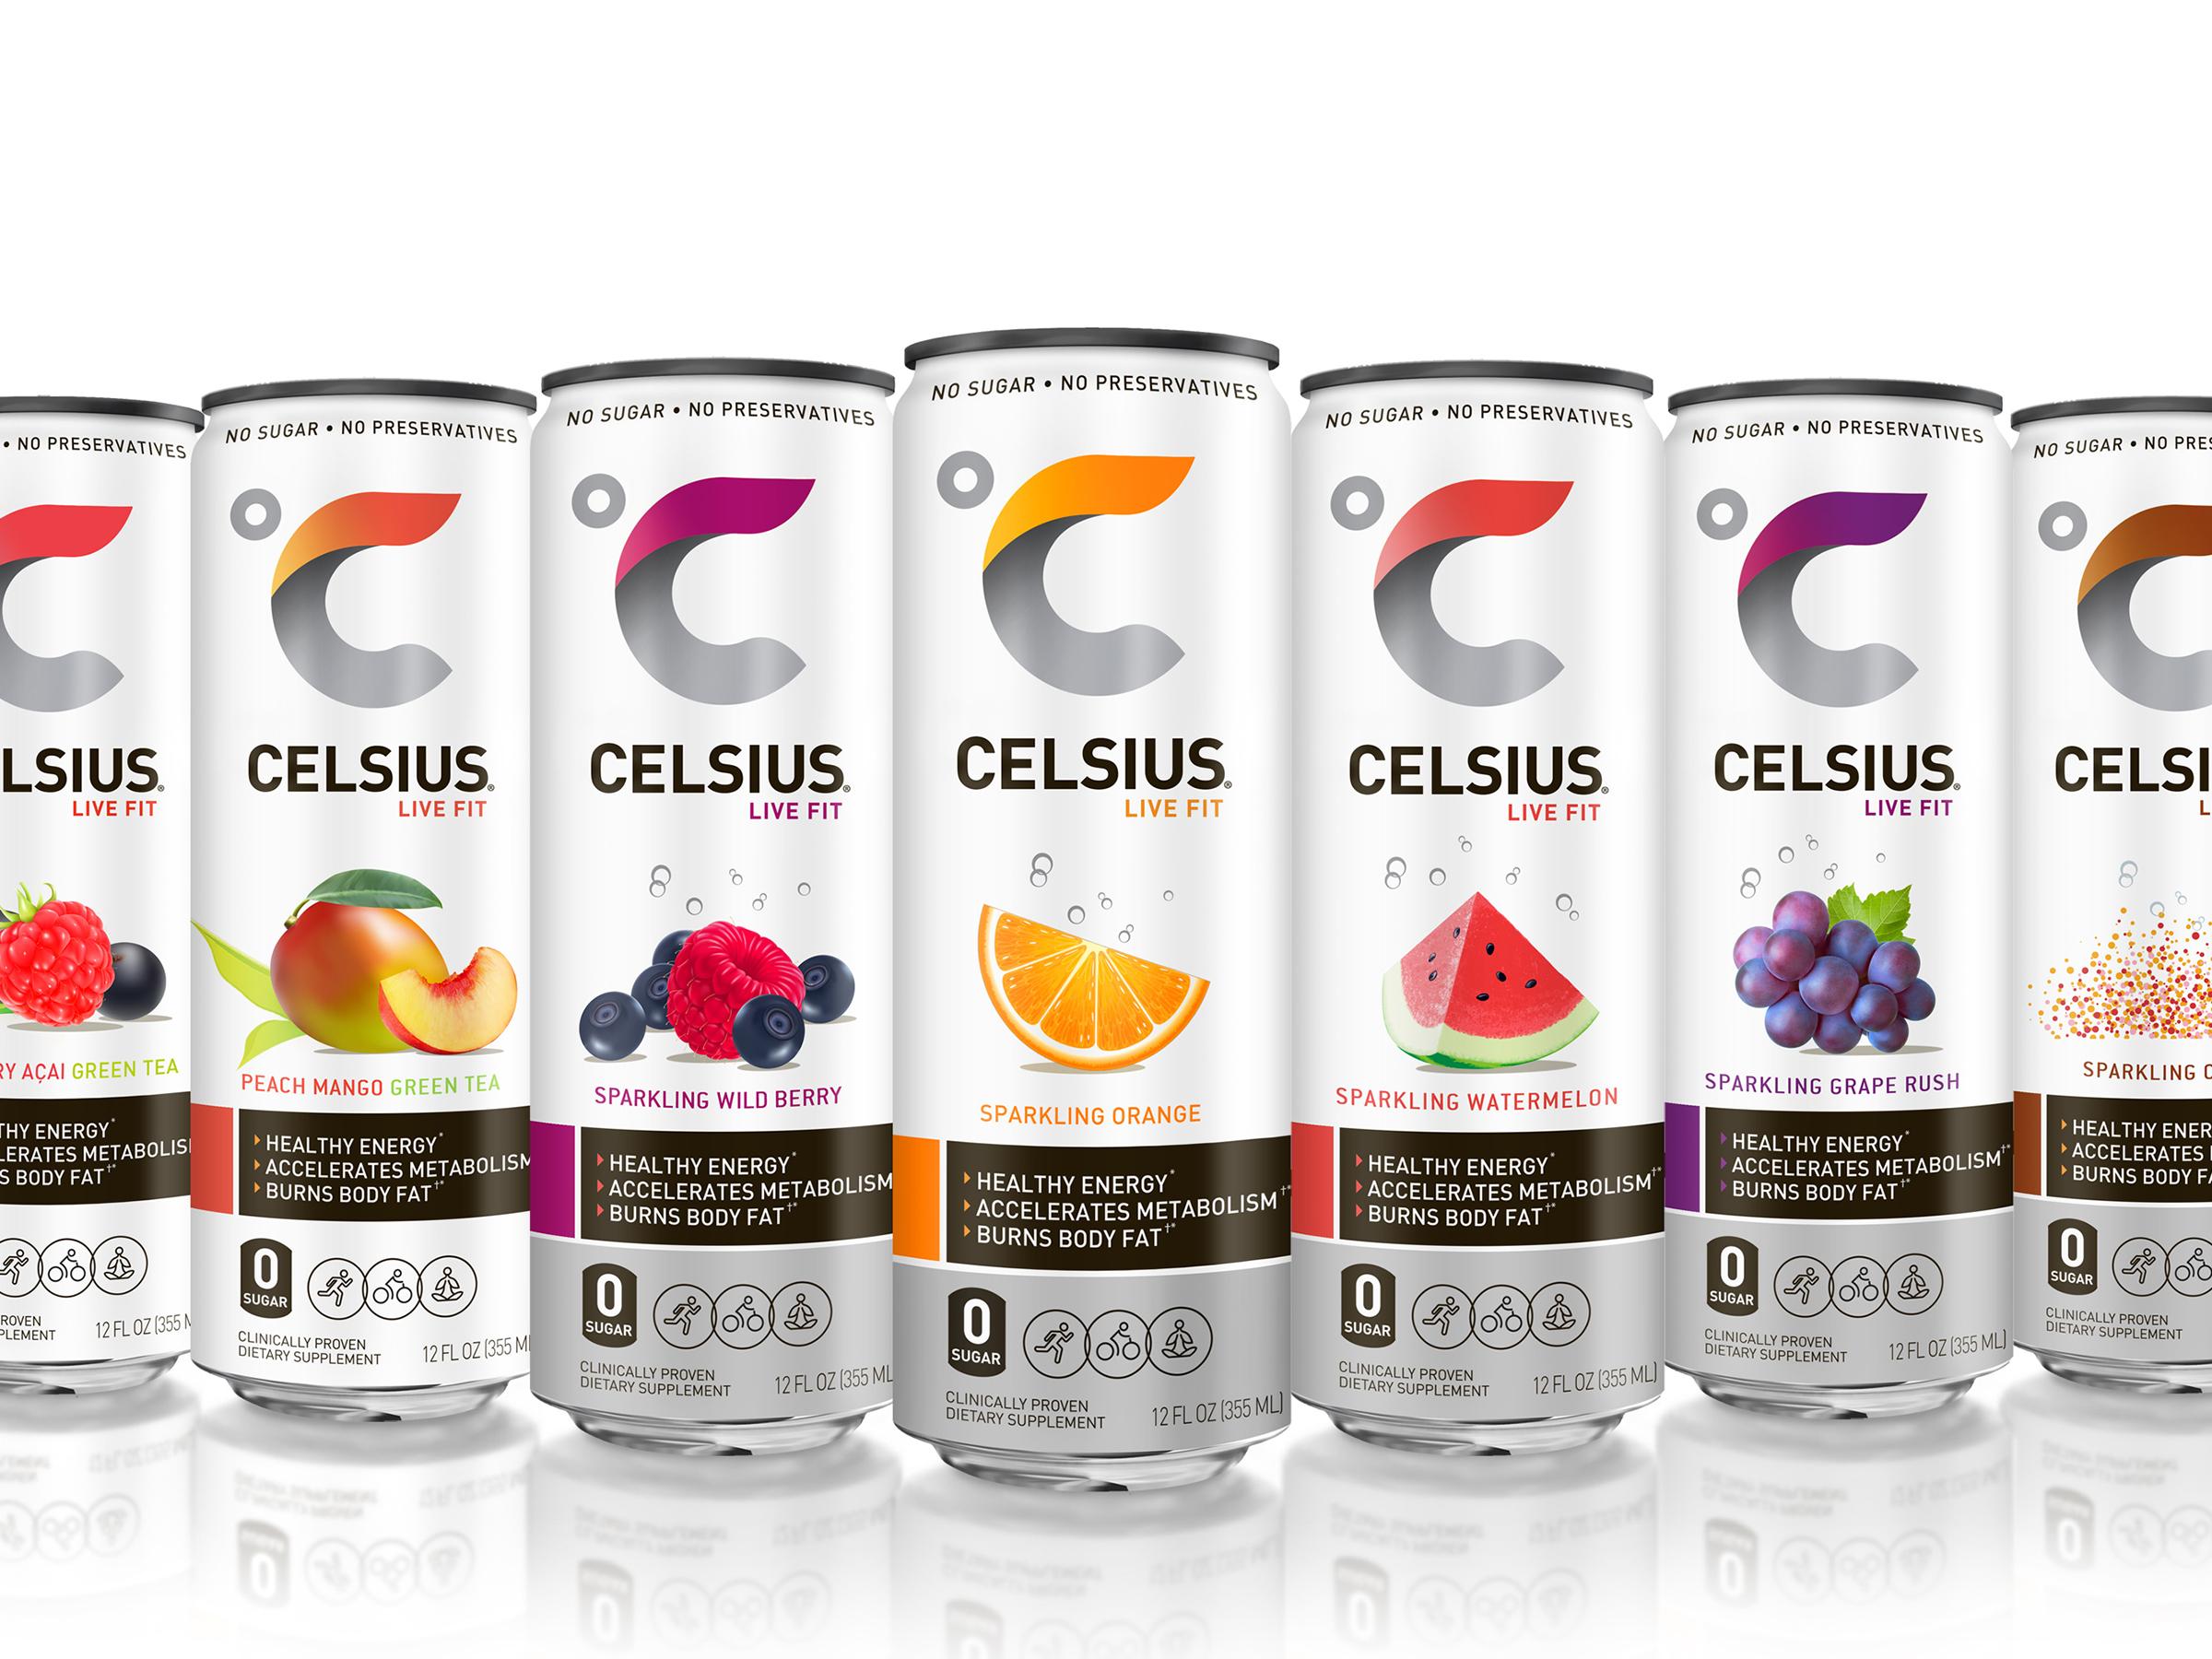 Celsius Healthy Energy Beverage   Dieline - Design, Branding & Packaging  Inspiration